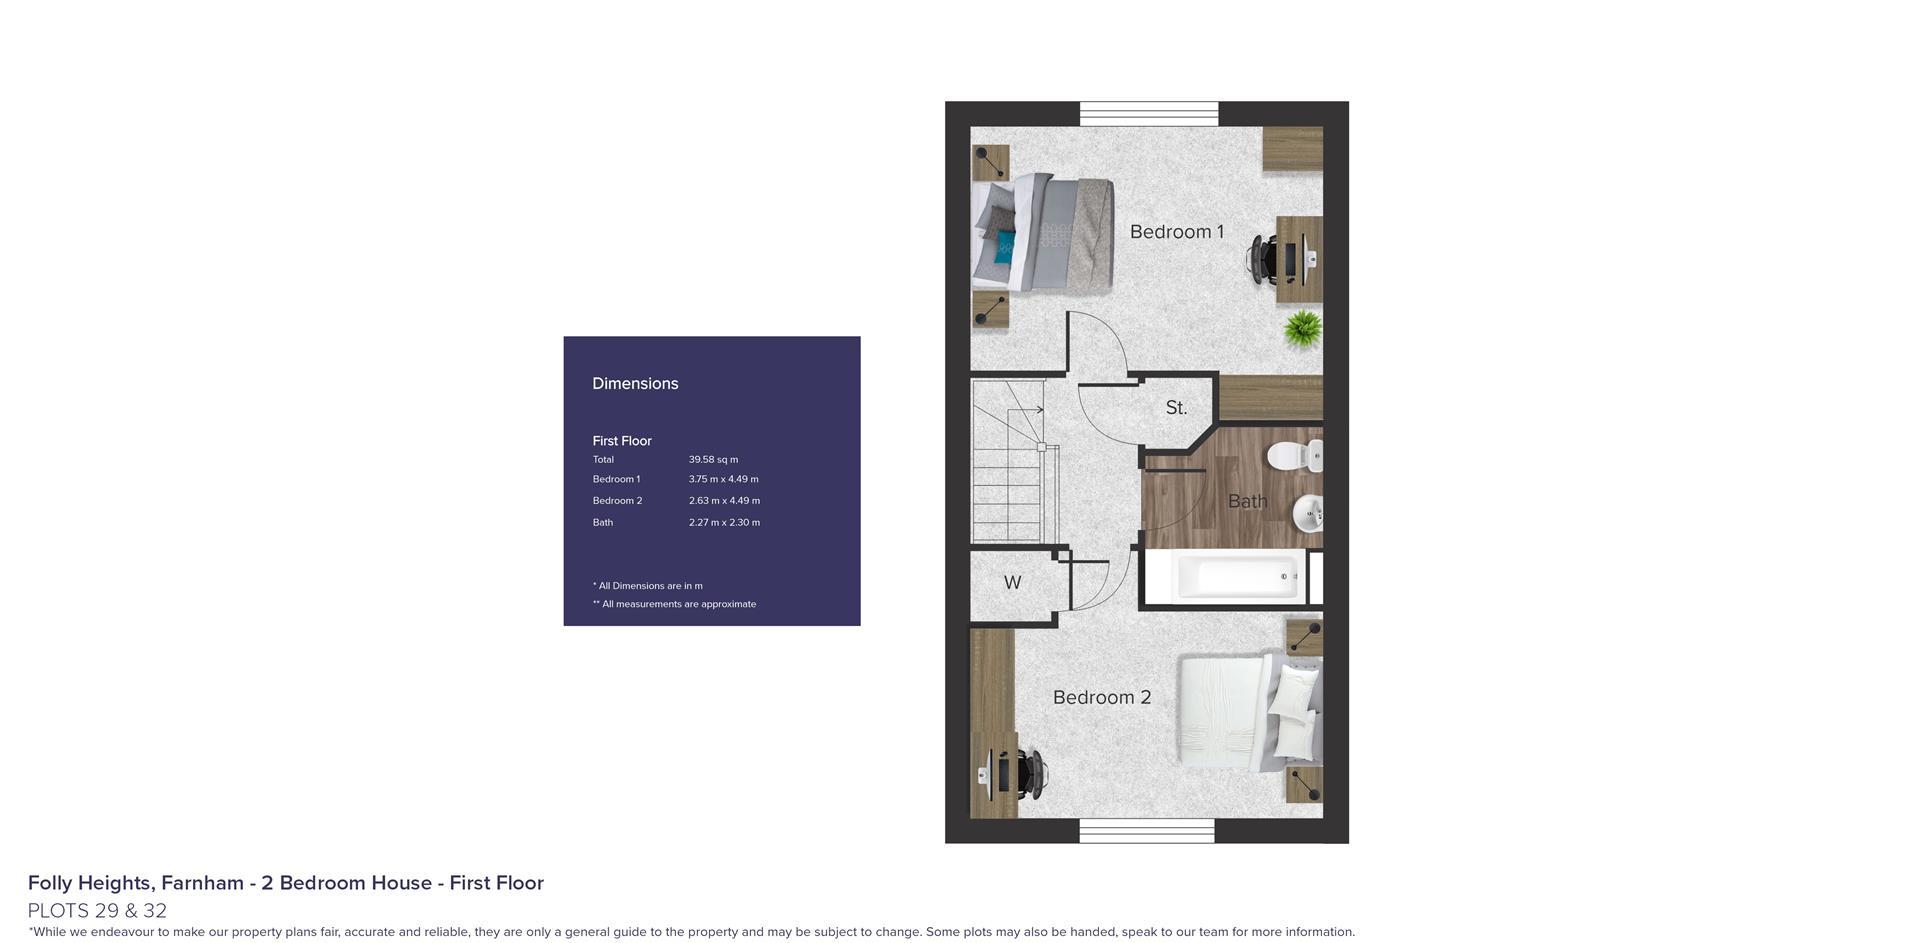 Folly Heights, Farnham_ Plots 29 & 32_FF_B.jpg